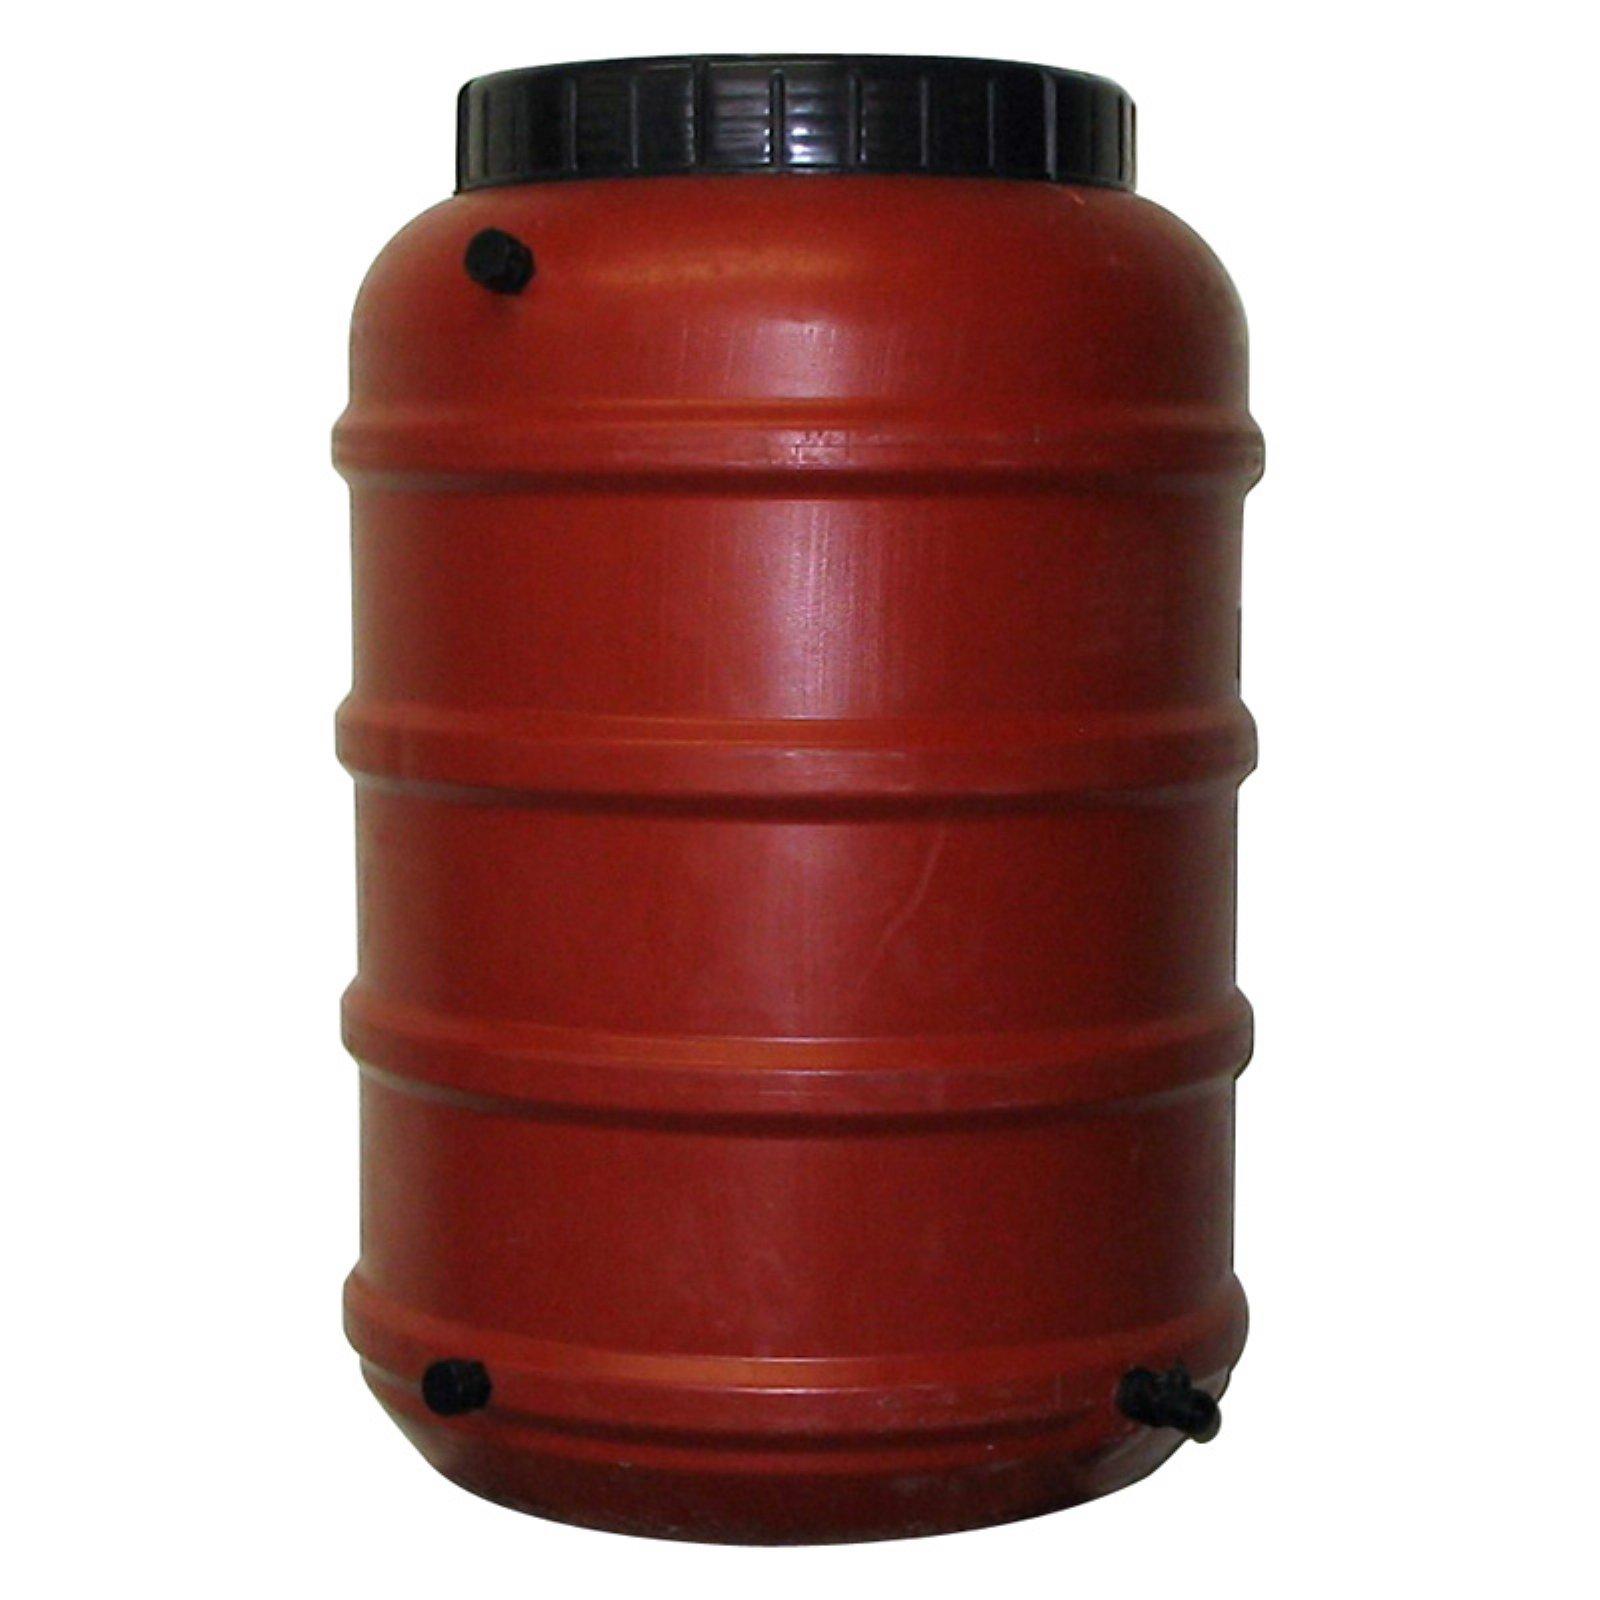 Upcycle 50 Gallon Terra-Cotta Rain Barrel